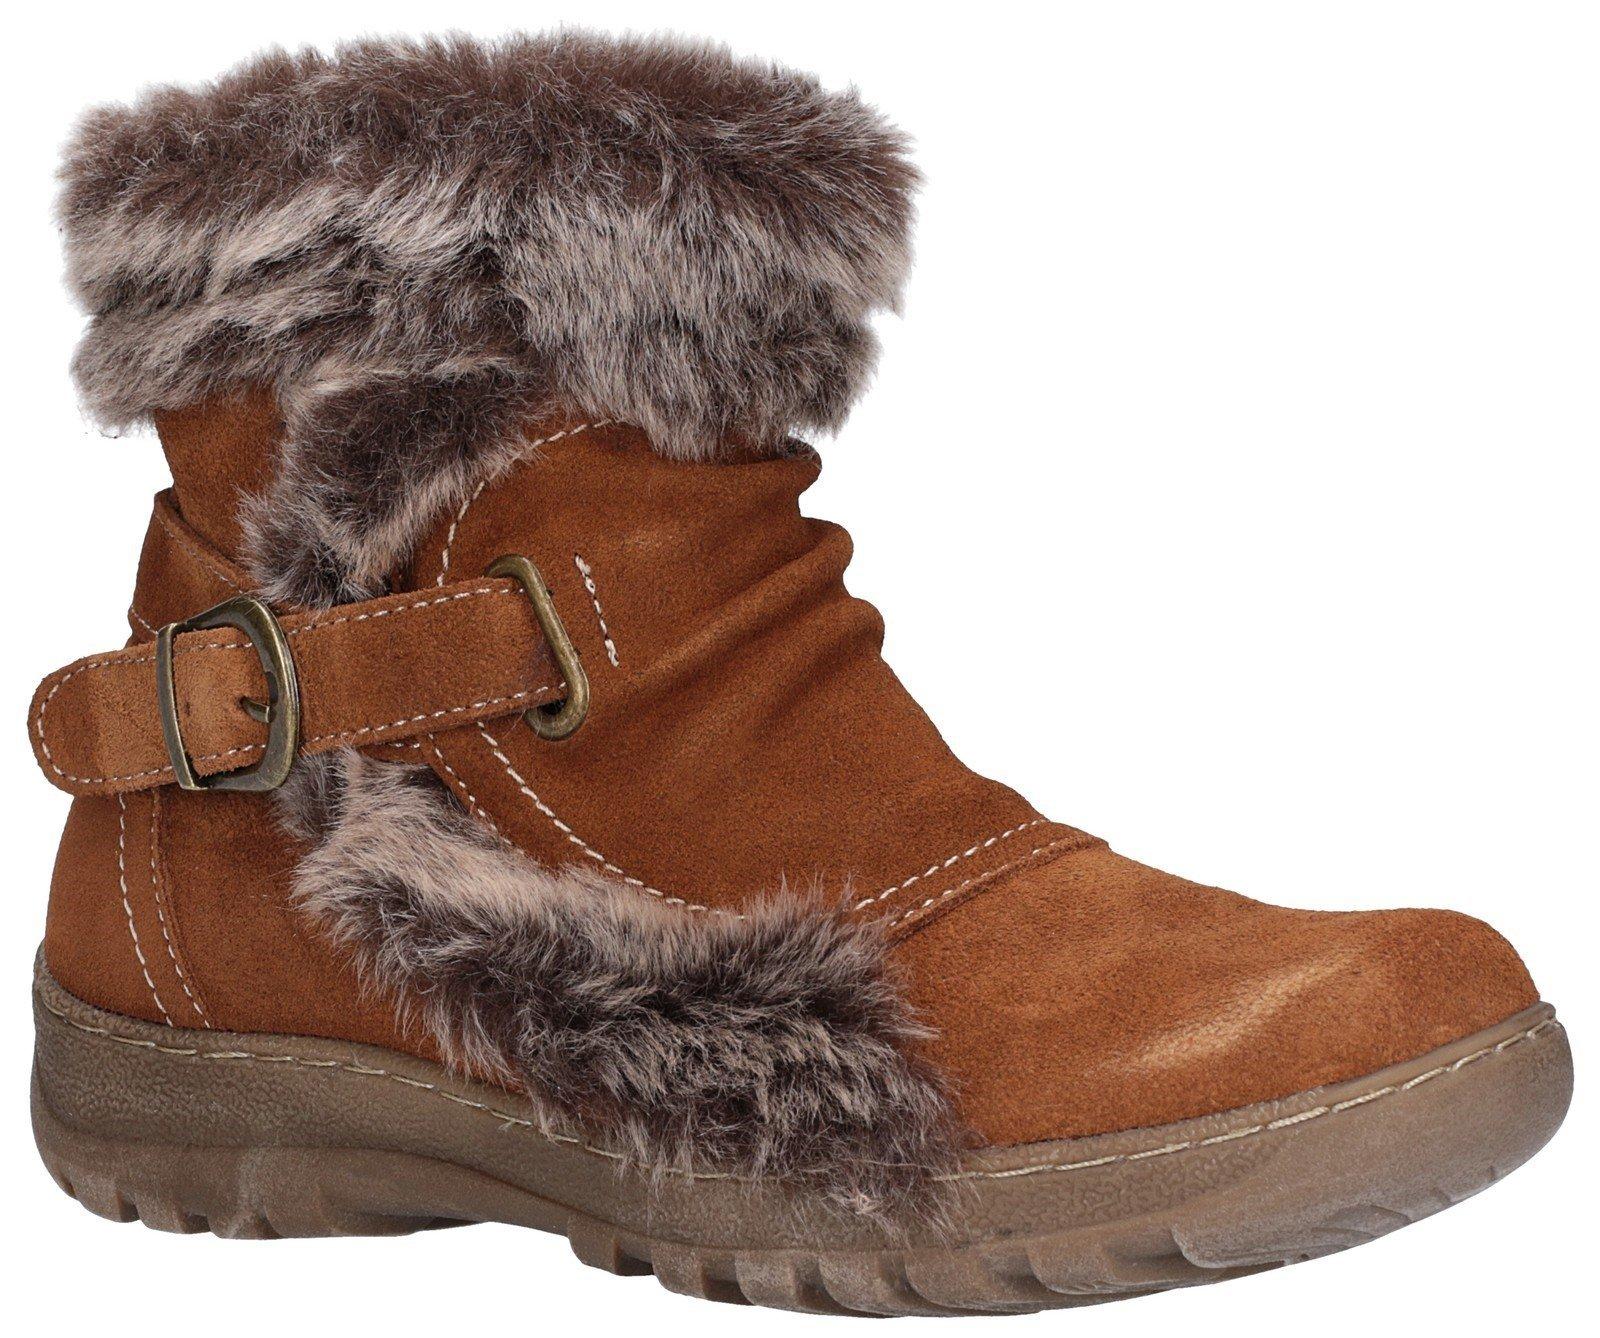 Fleet & Foster Women's Ginny Ankle Boot Brown 27143-45598 - Tan 5